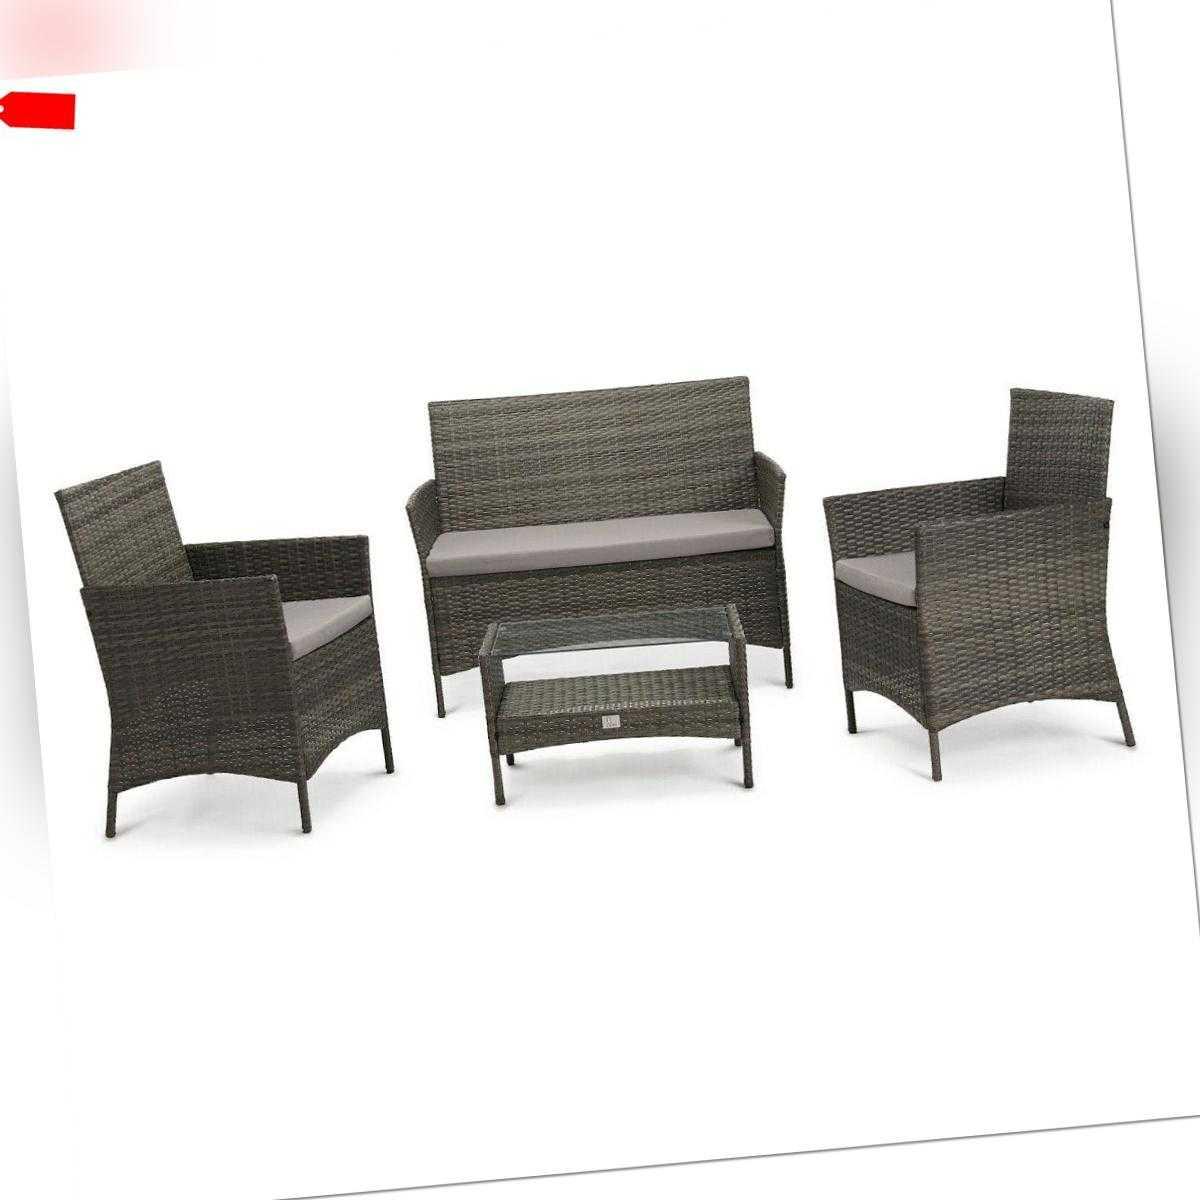 SVITA BROOKLYN 2020 Polyrattan Sitzgruppe Lounge Garnitur Gartenmöbel Set grau